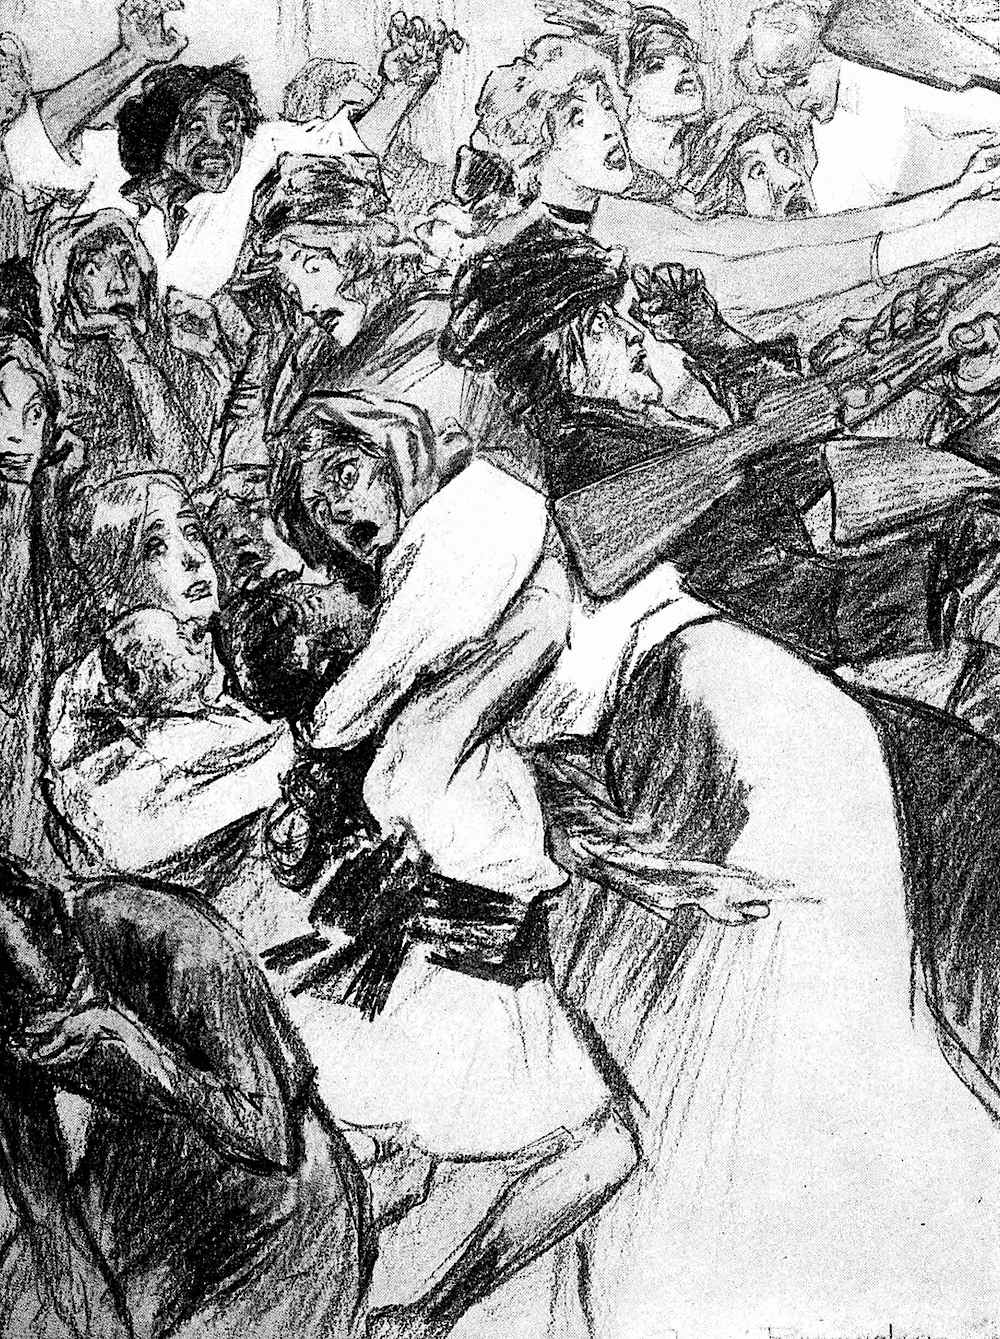 a Louis Raemaekers war cartoon, civilian women rifle butted